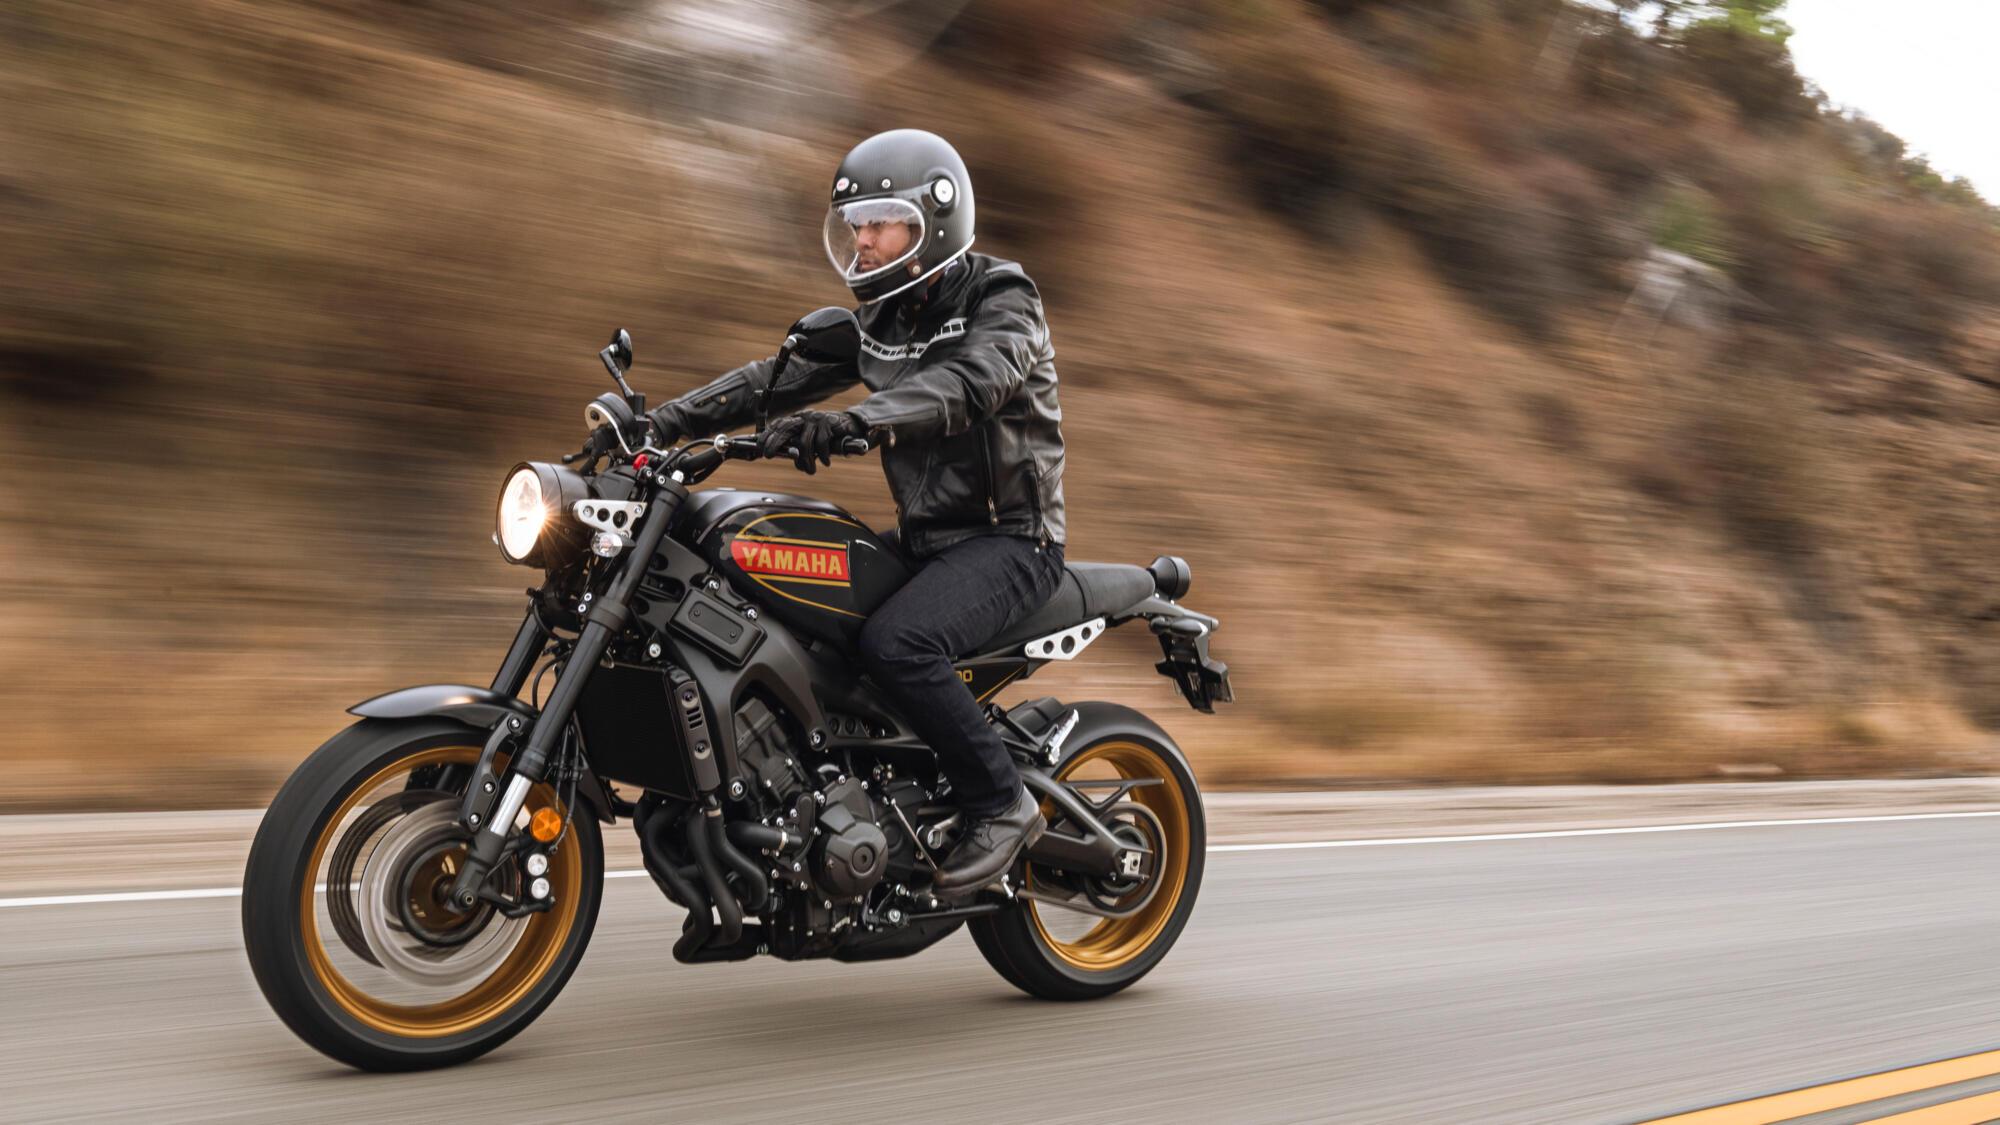 Yamaha XSR900 | MotorCentrumWest